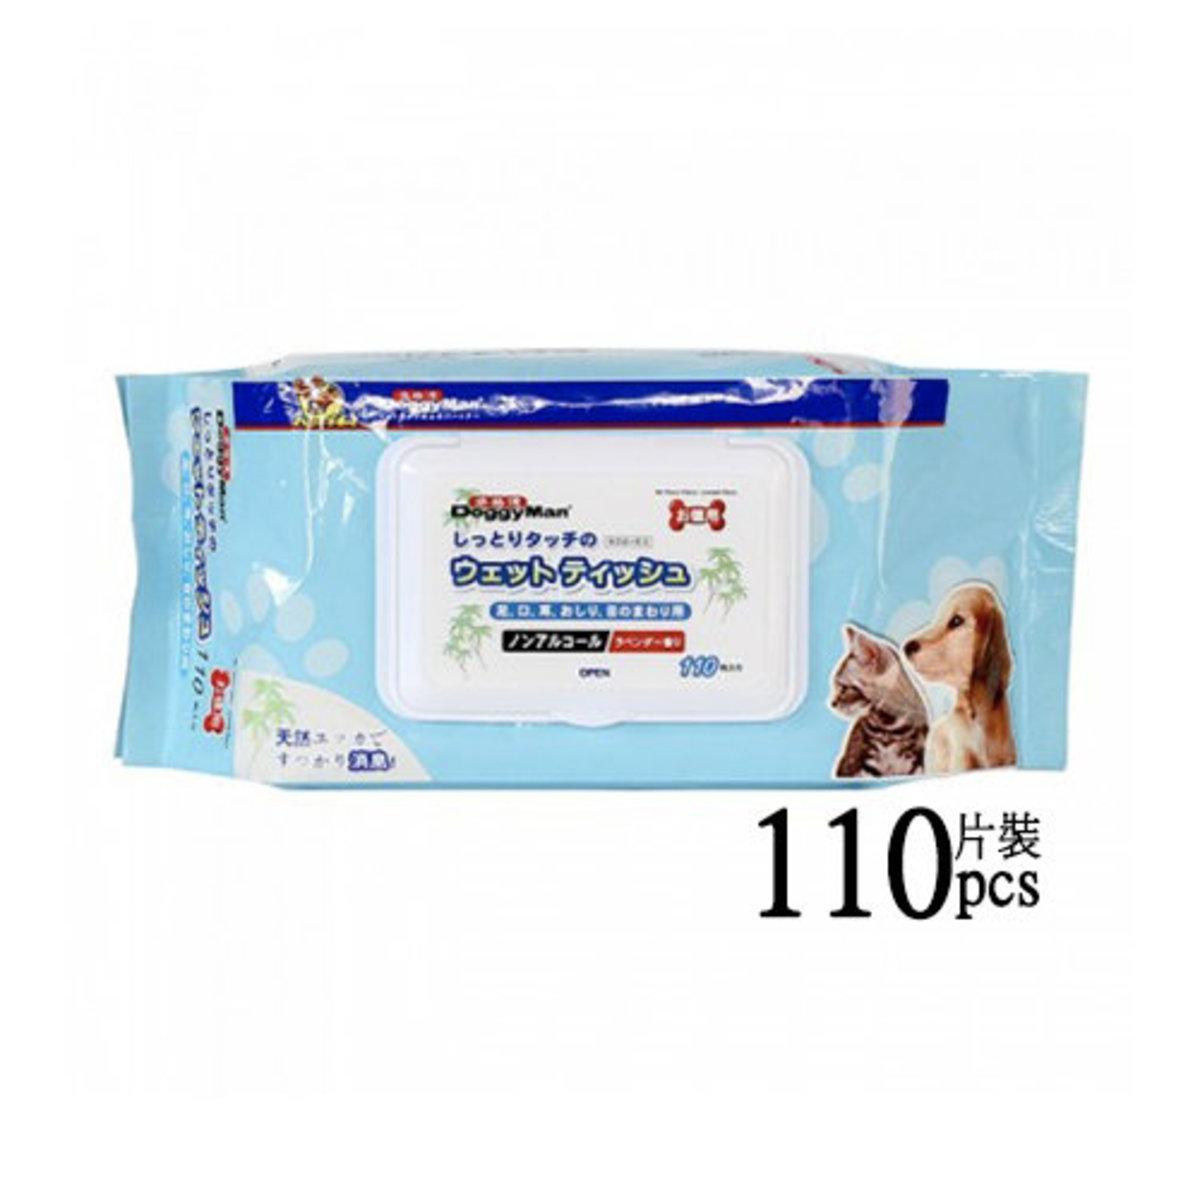 Wet Tissue / Wipes  for Pets (Lavender) 110pcs #45832 Y